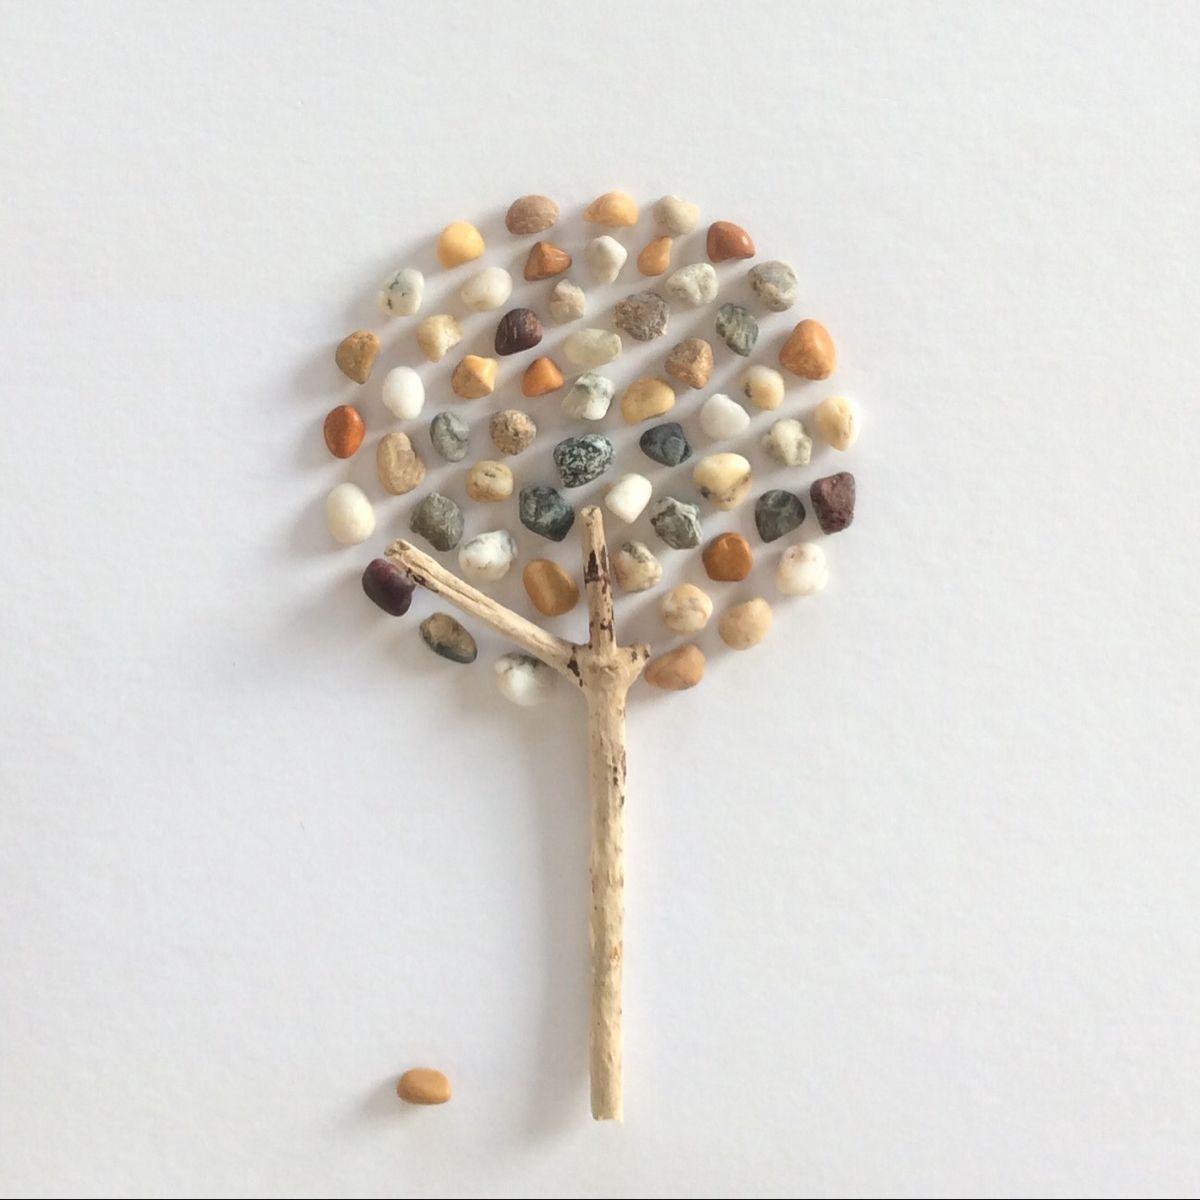 55+ Beautiful Pebble Art Ideas